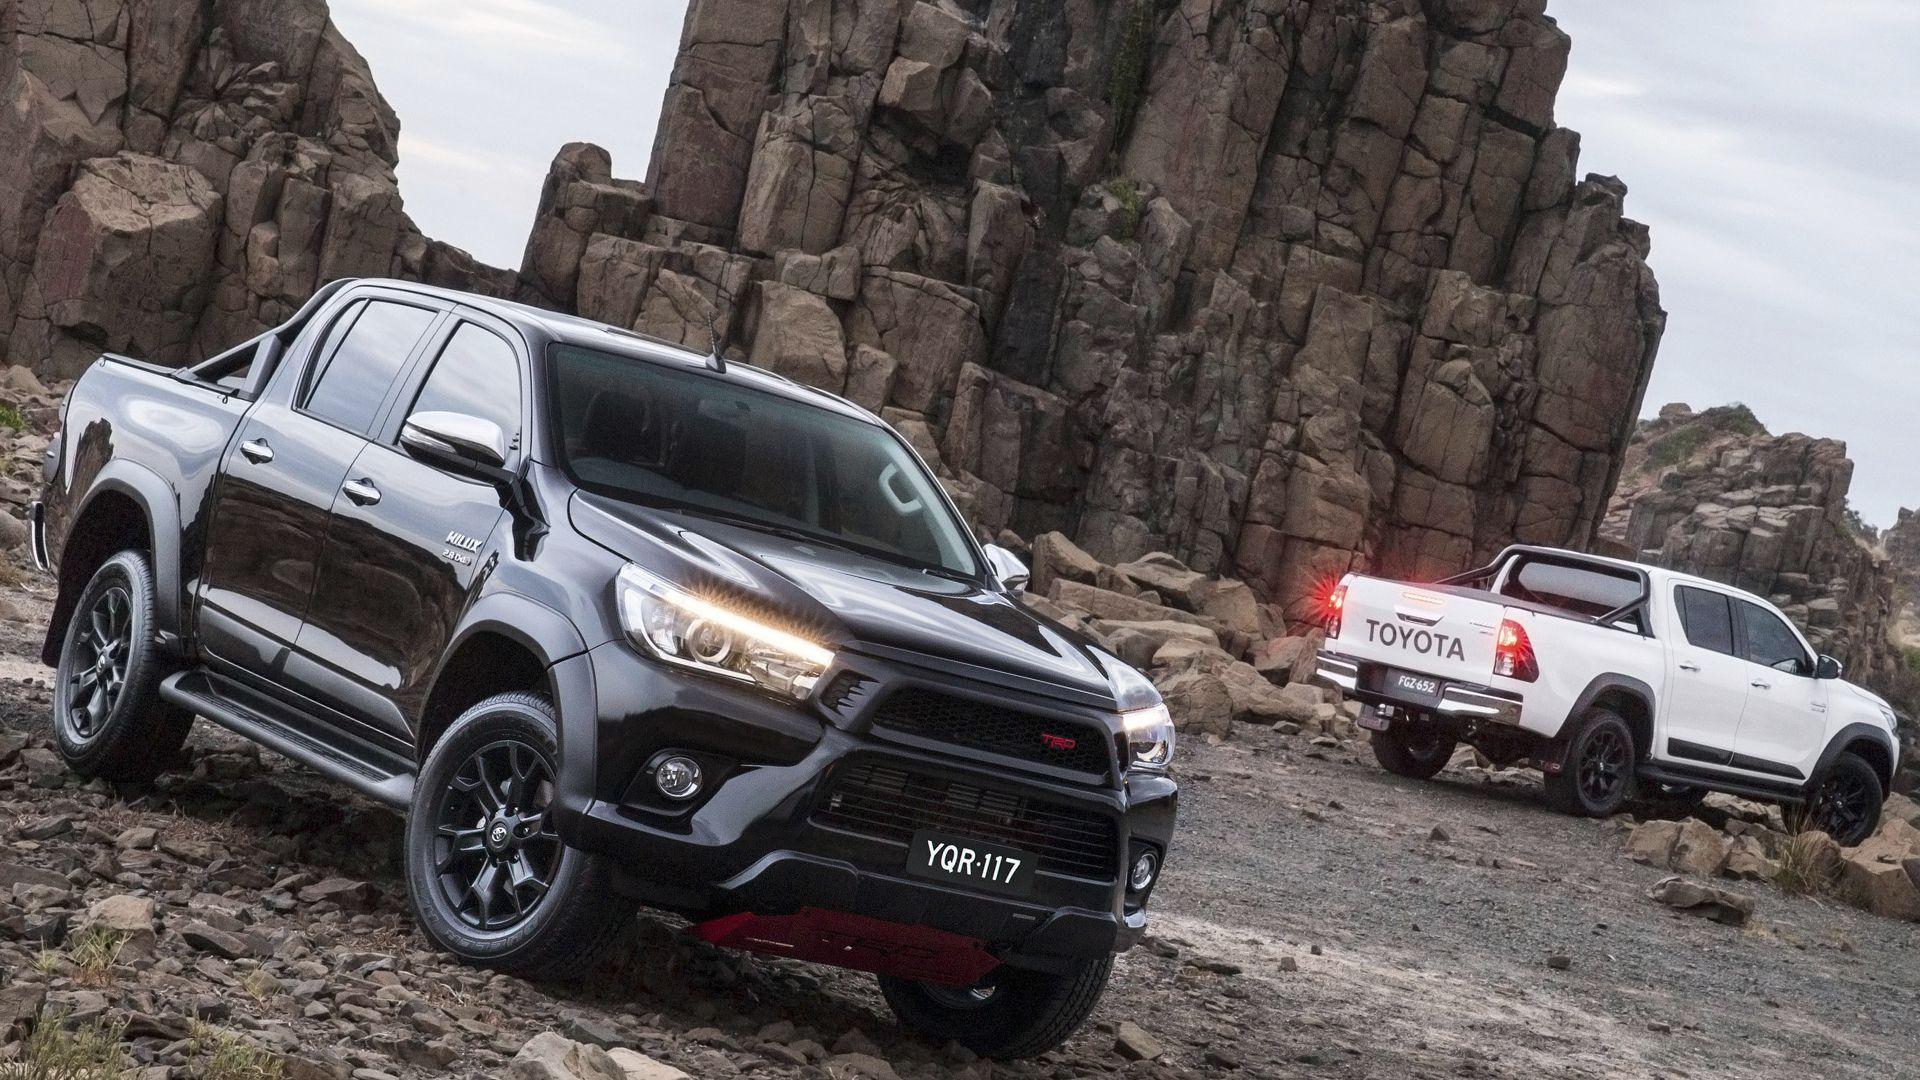 New 2019 Toyota Hilux Wallpaper HD Desktop Toyota car prices 1920x1080